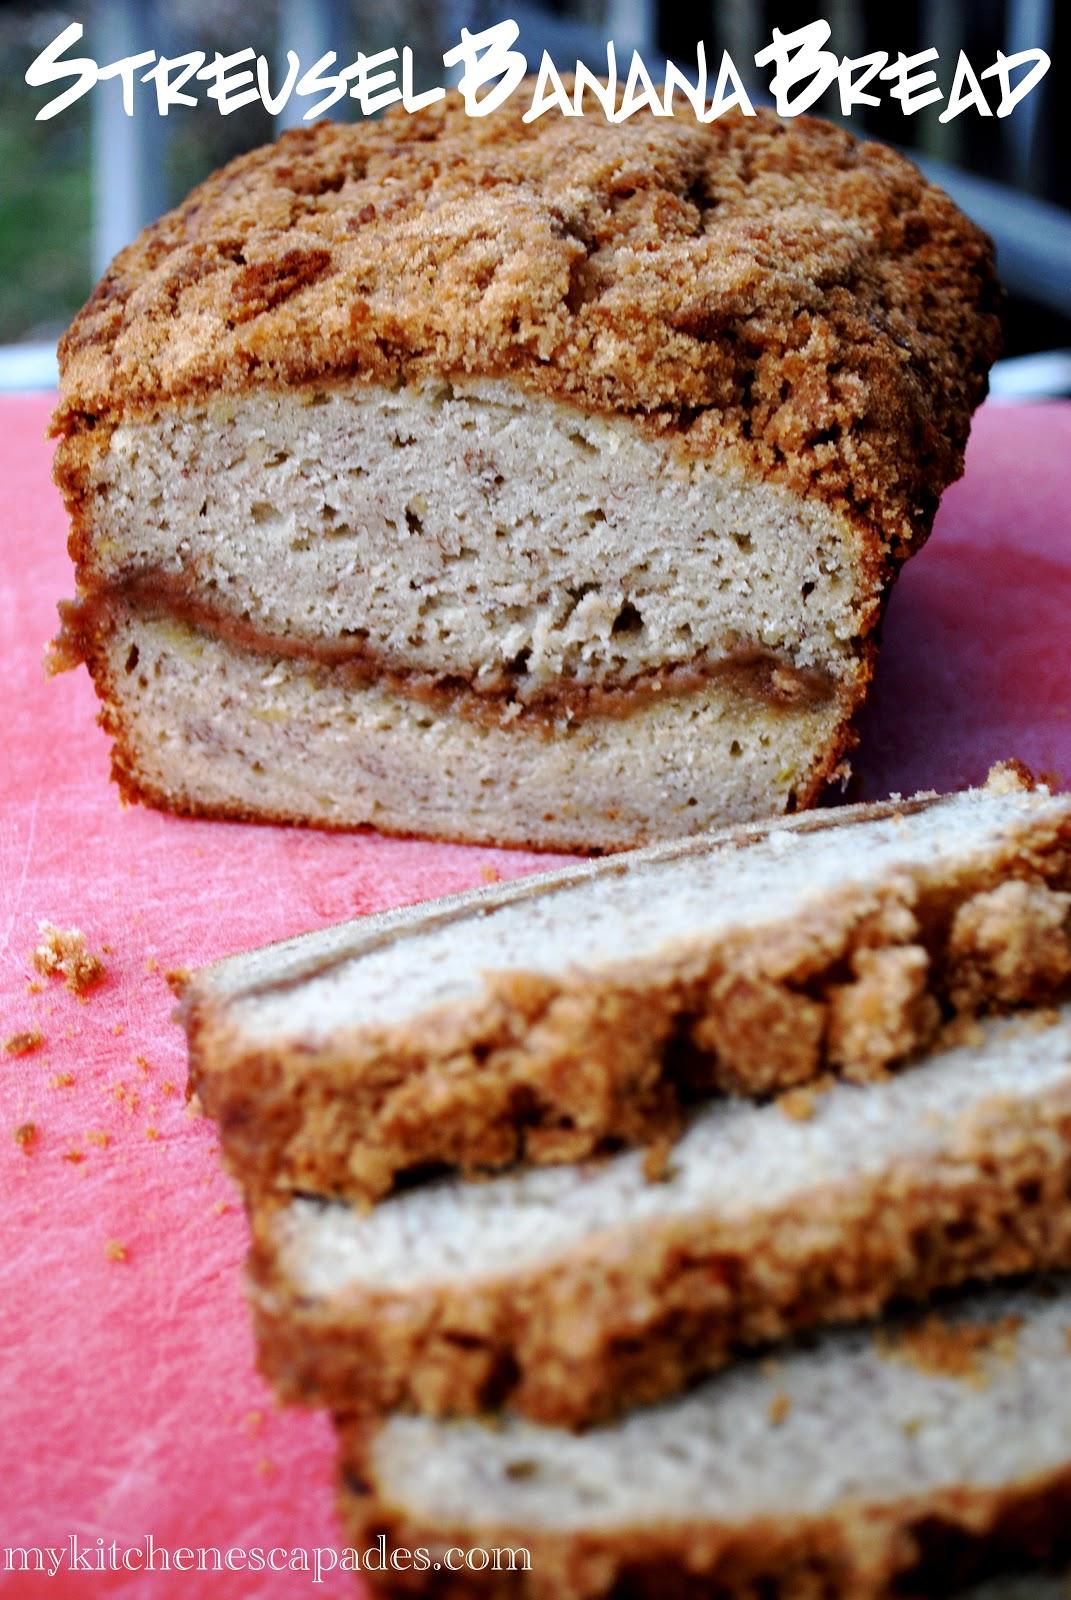 Streusel banana bread streusel banana bread forumfinder Choice Image